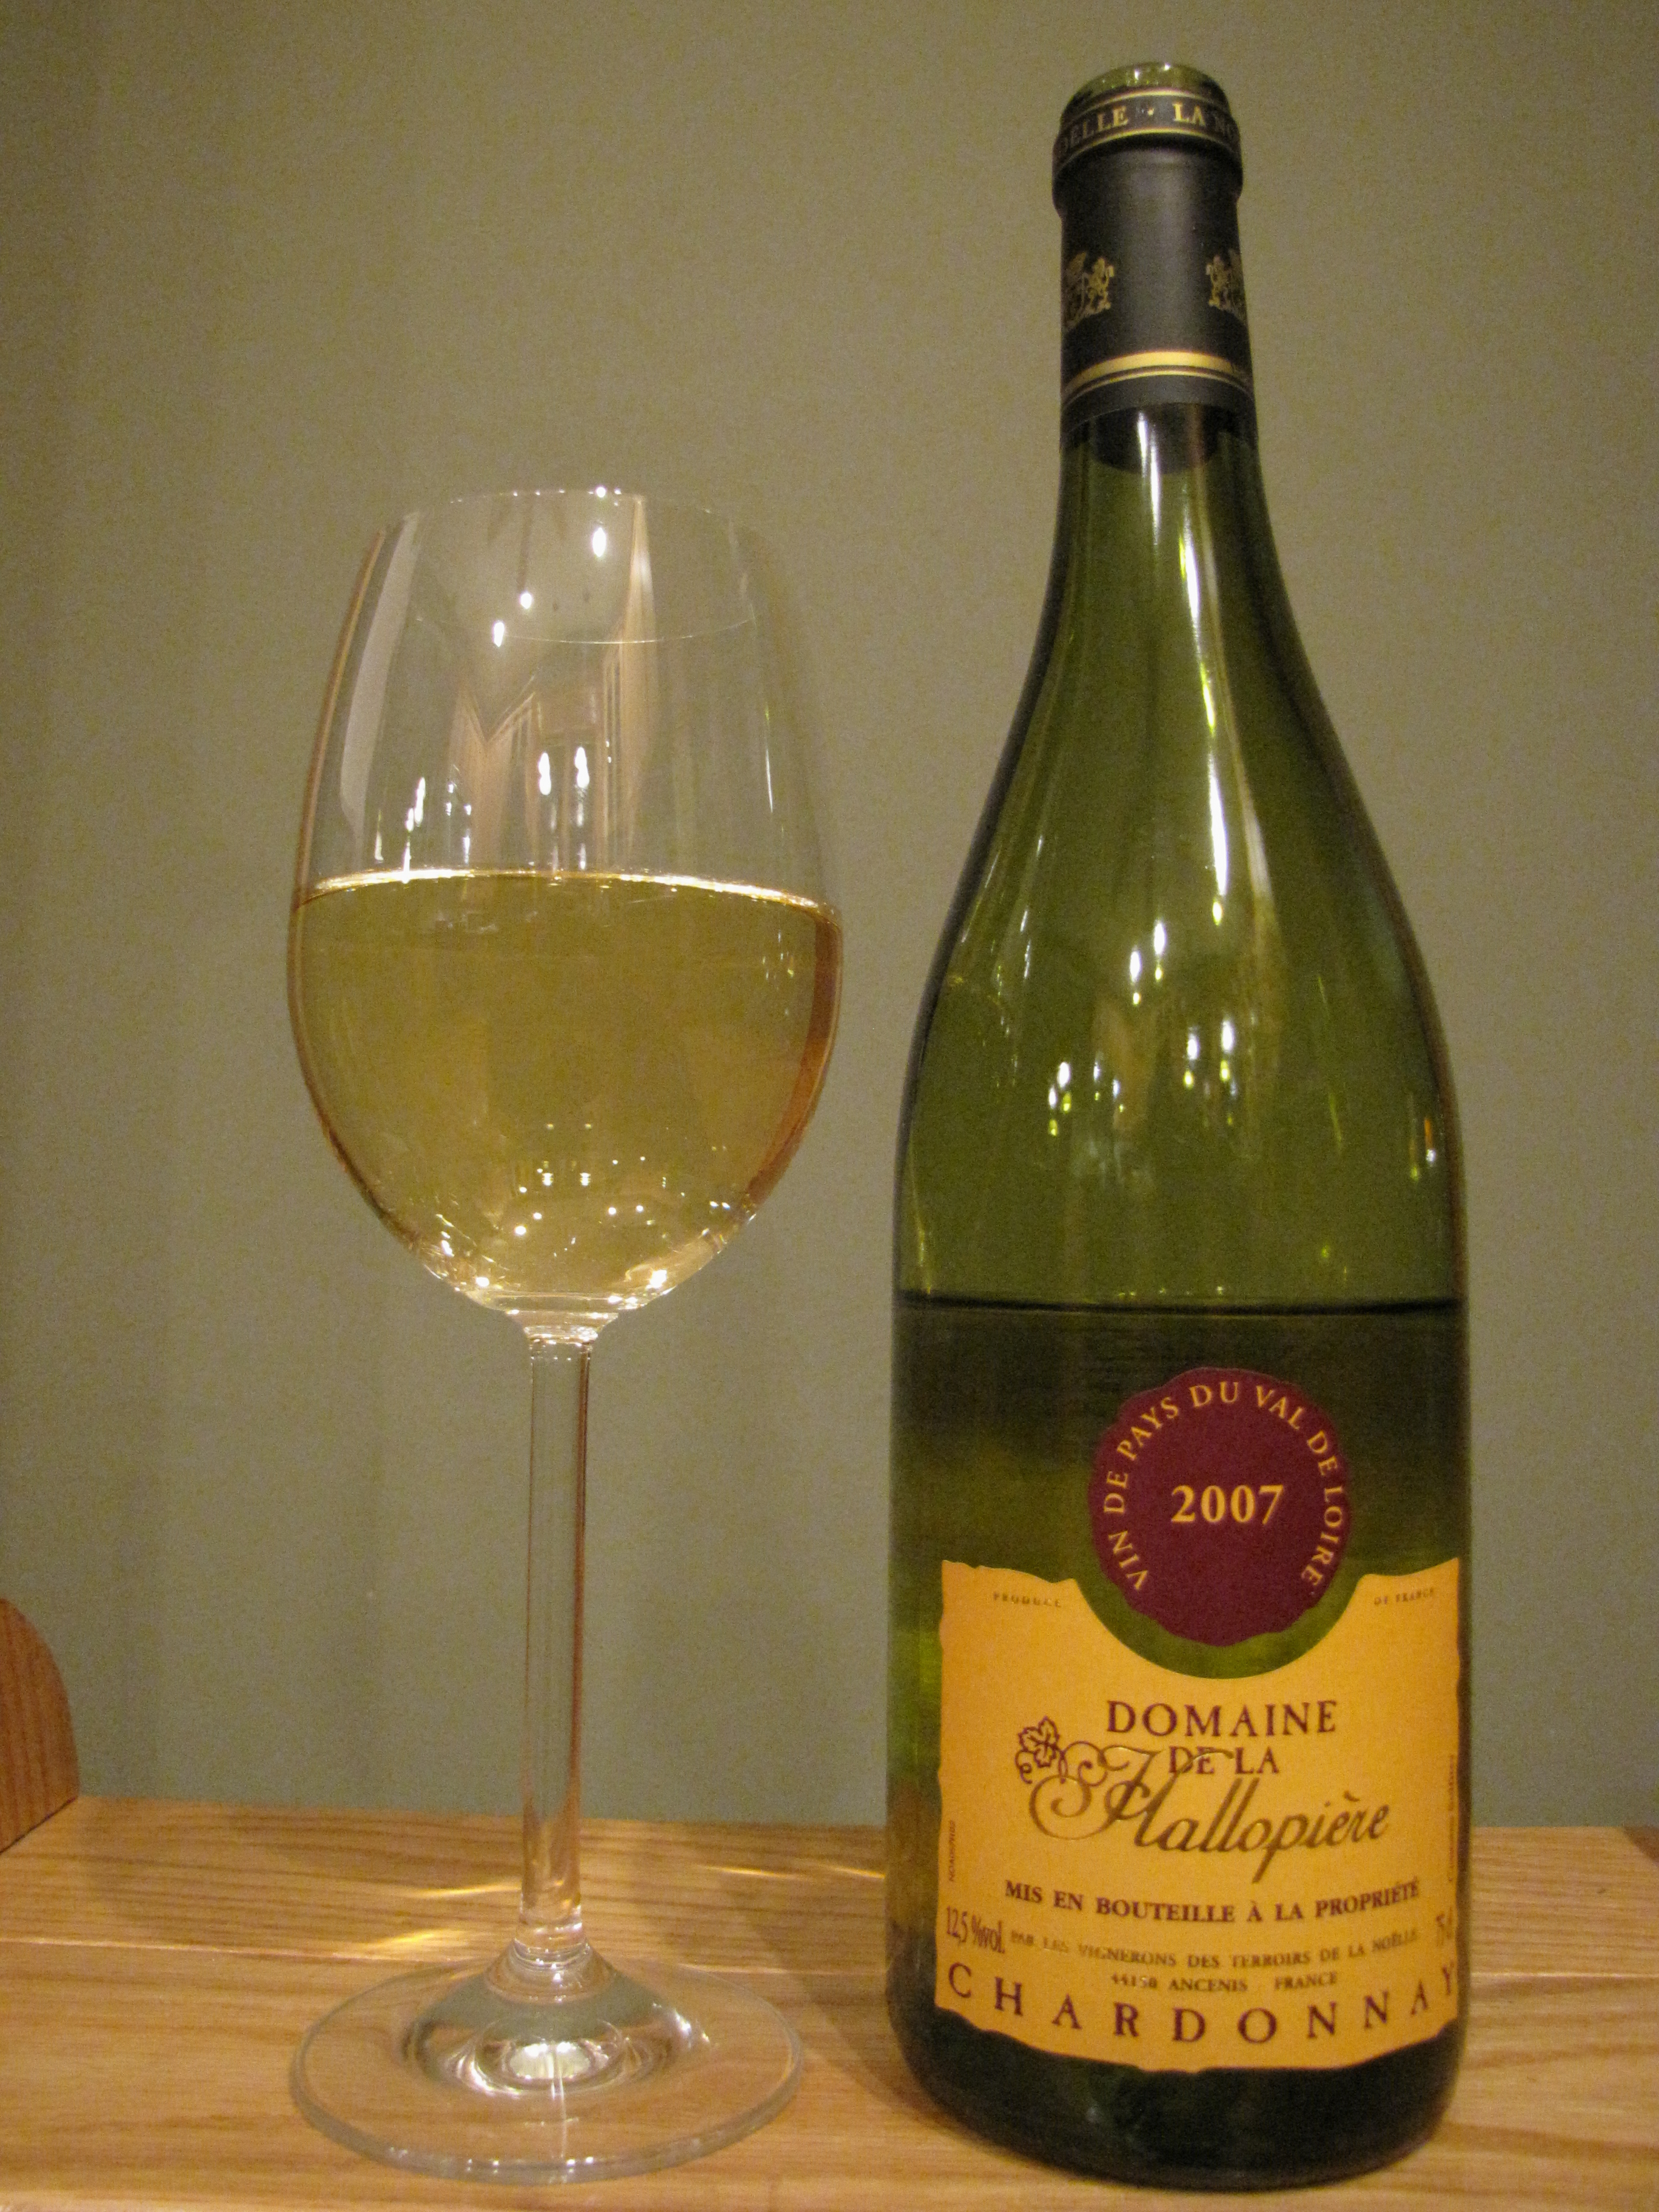 Hallopière Chardonnay (2007)